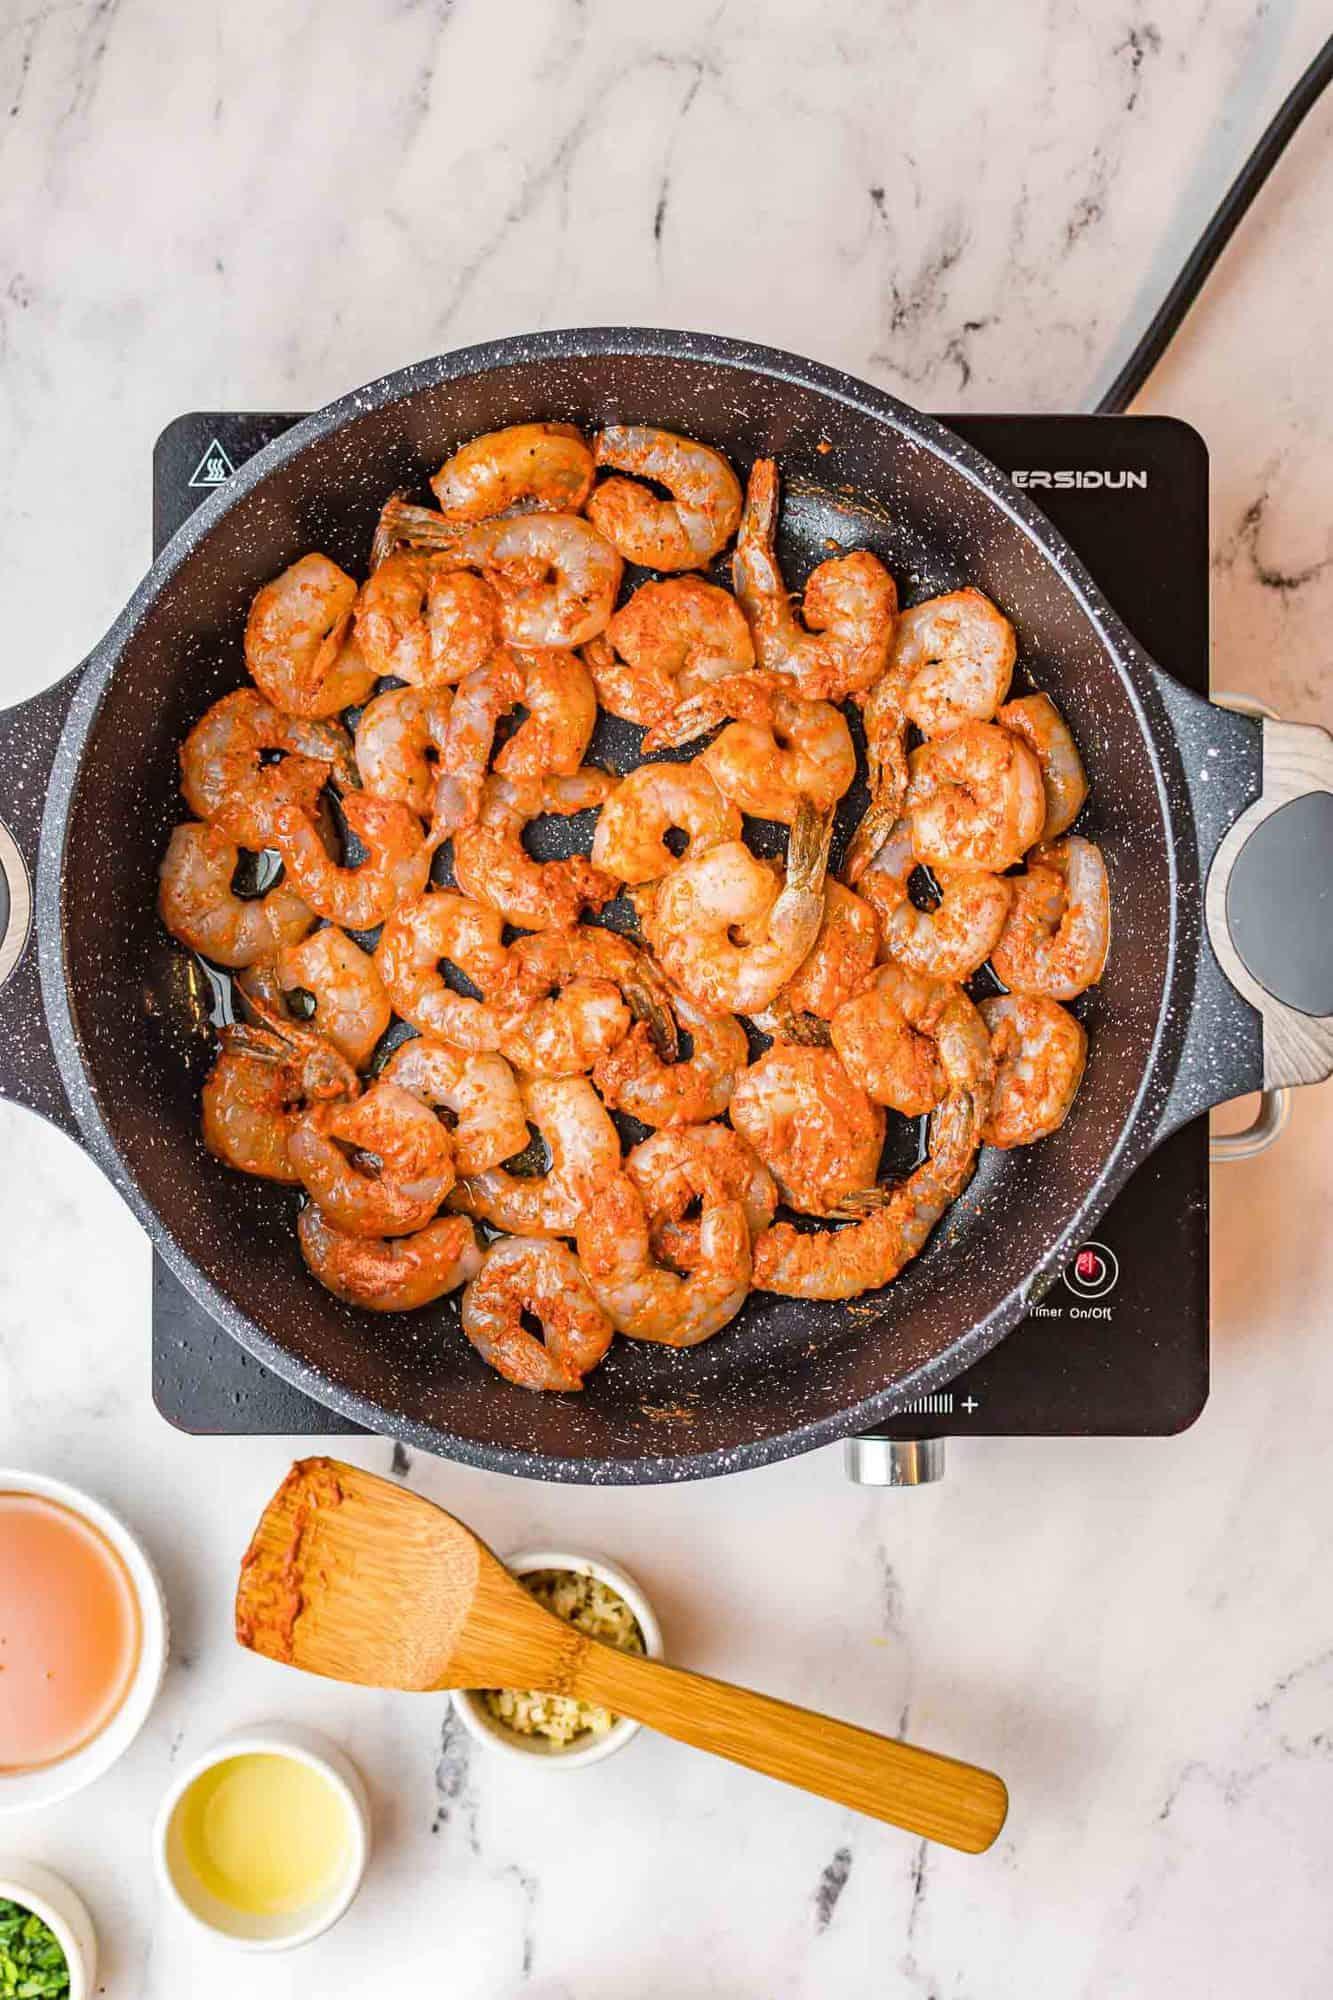 Seasoned shrimp in a skillet.